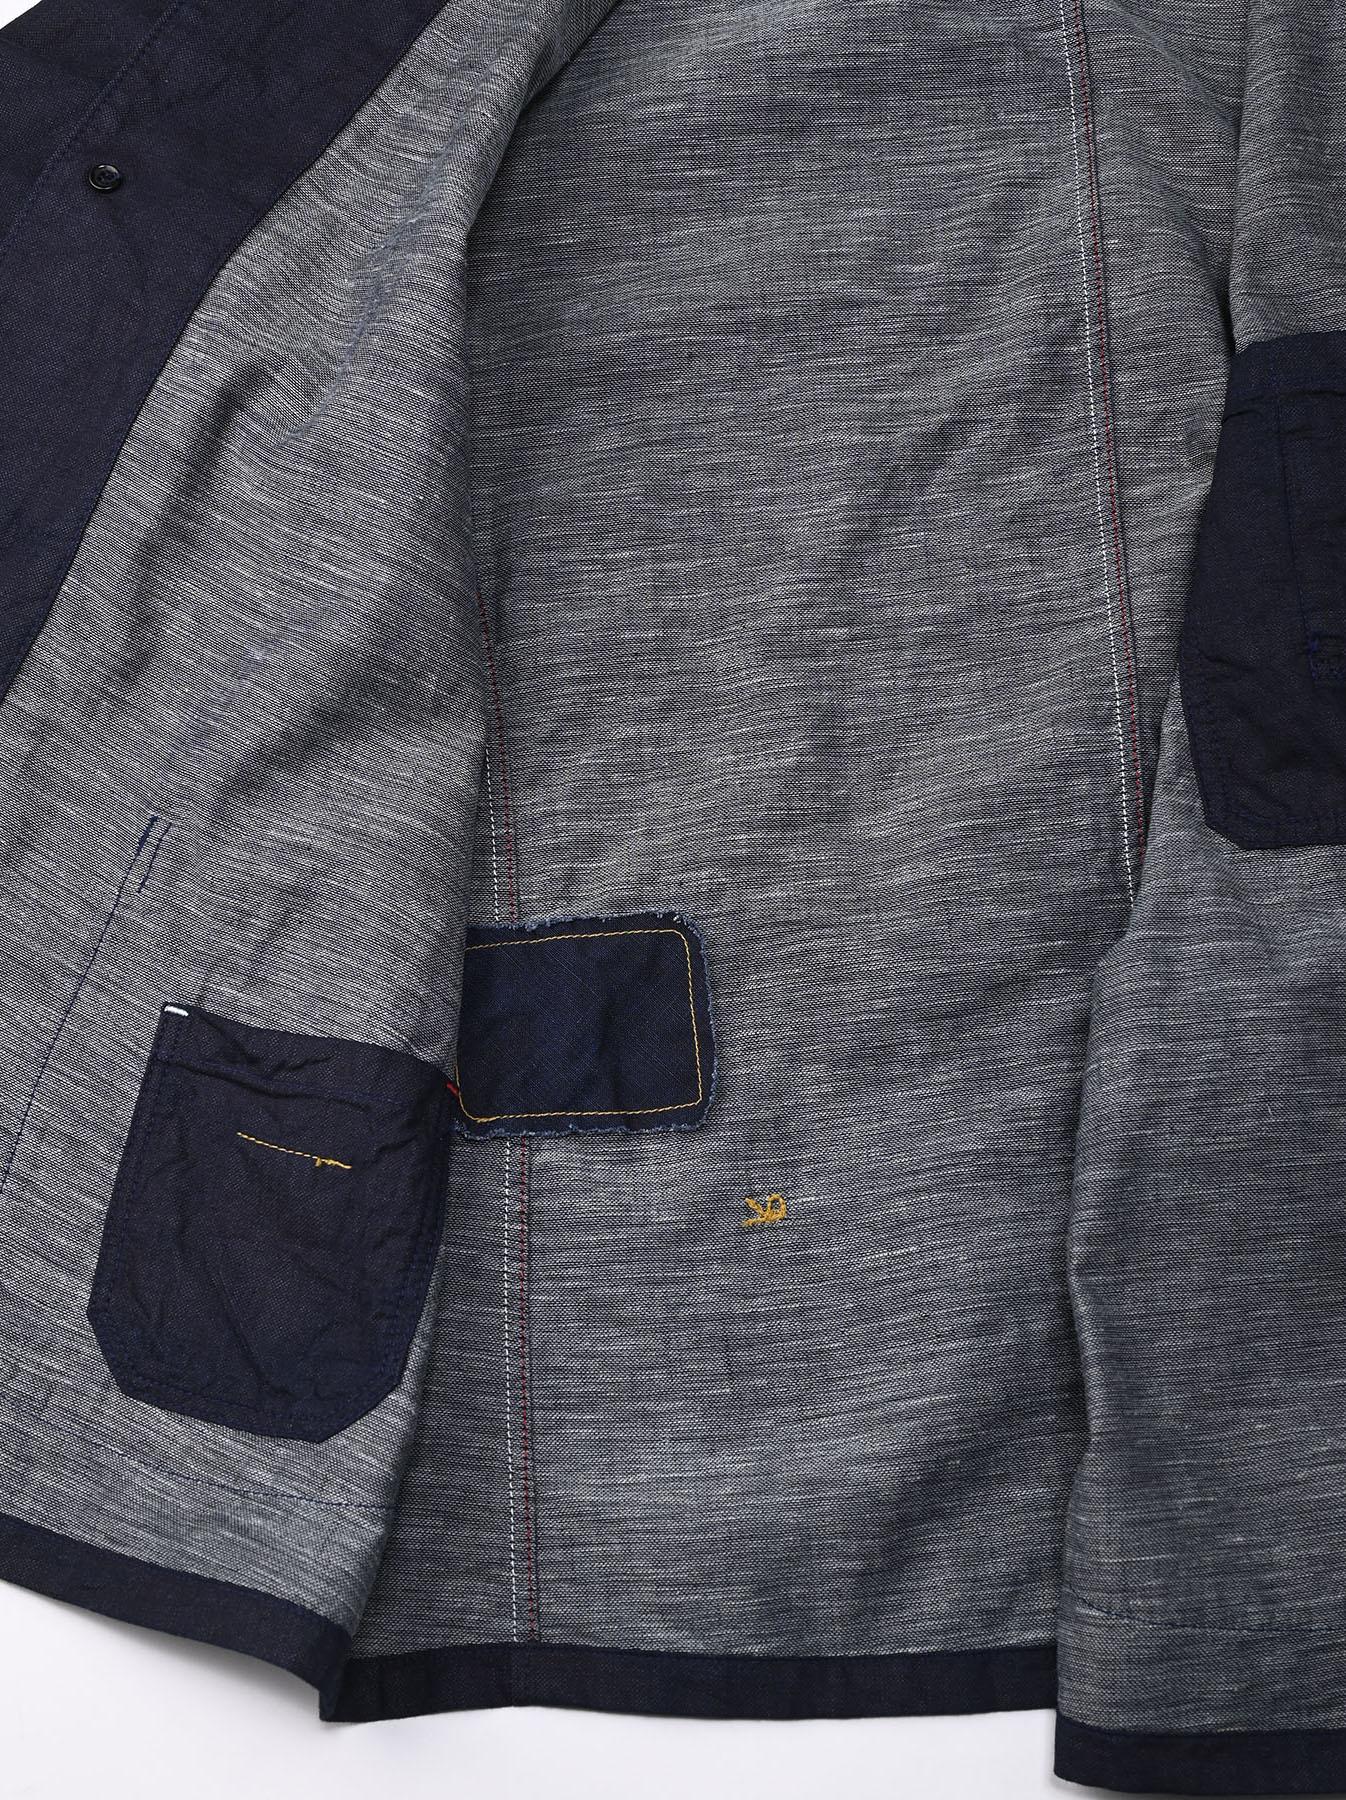 Indigo Double Woven 908 Shirt Jacket (0421)-12